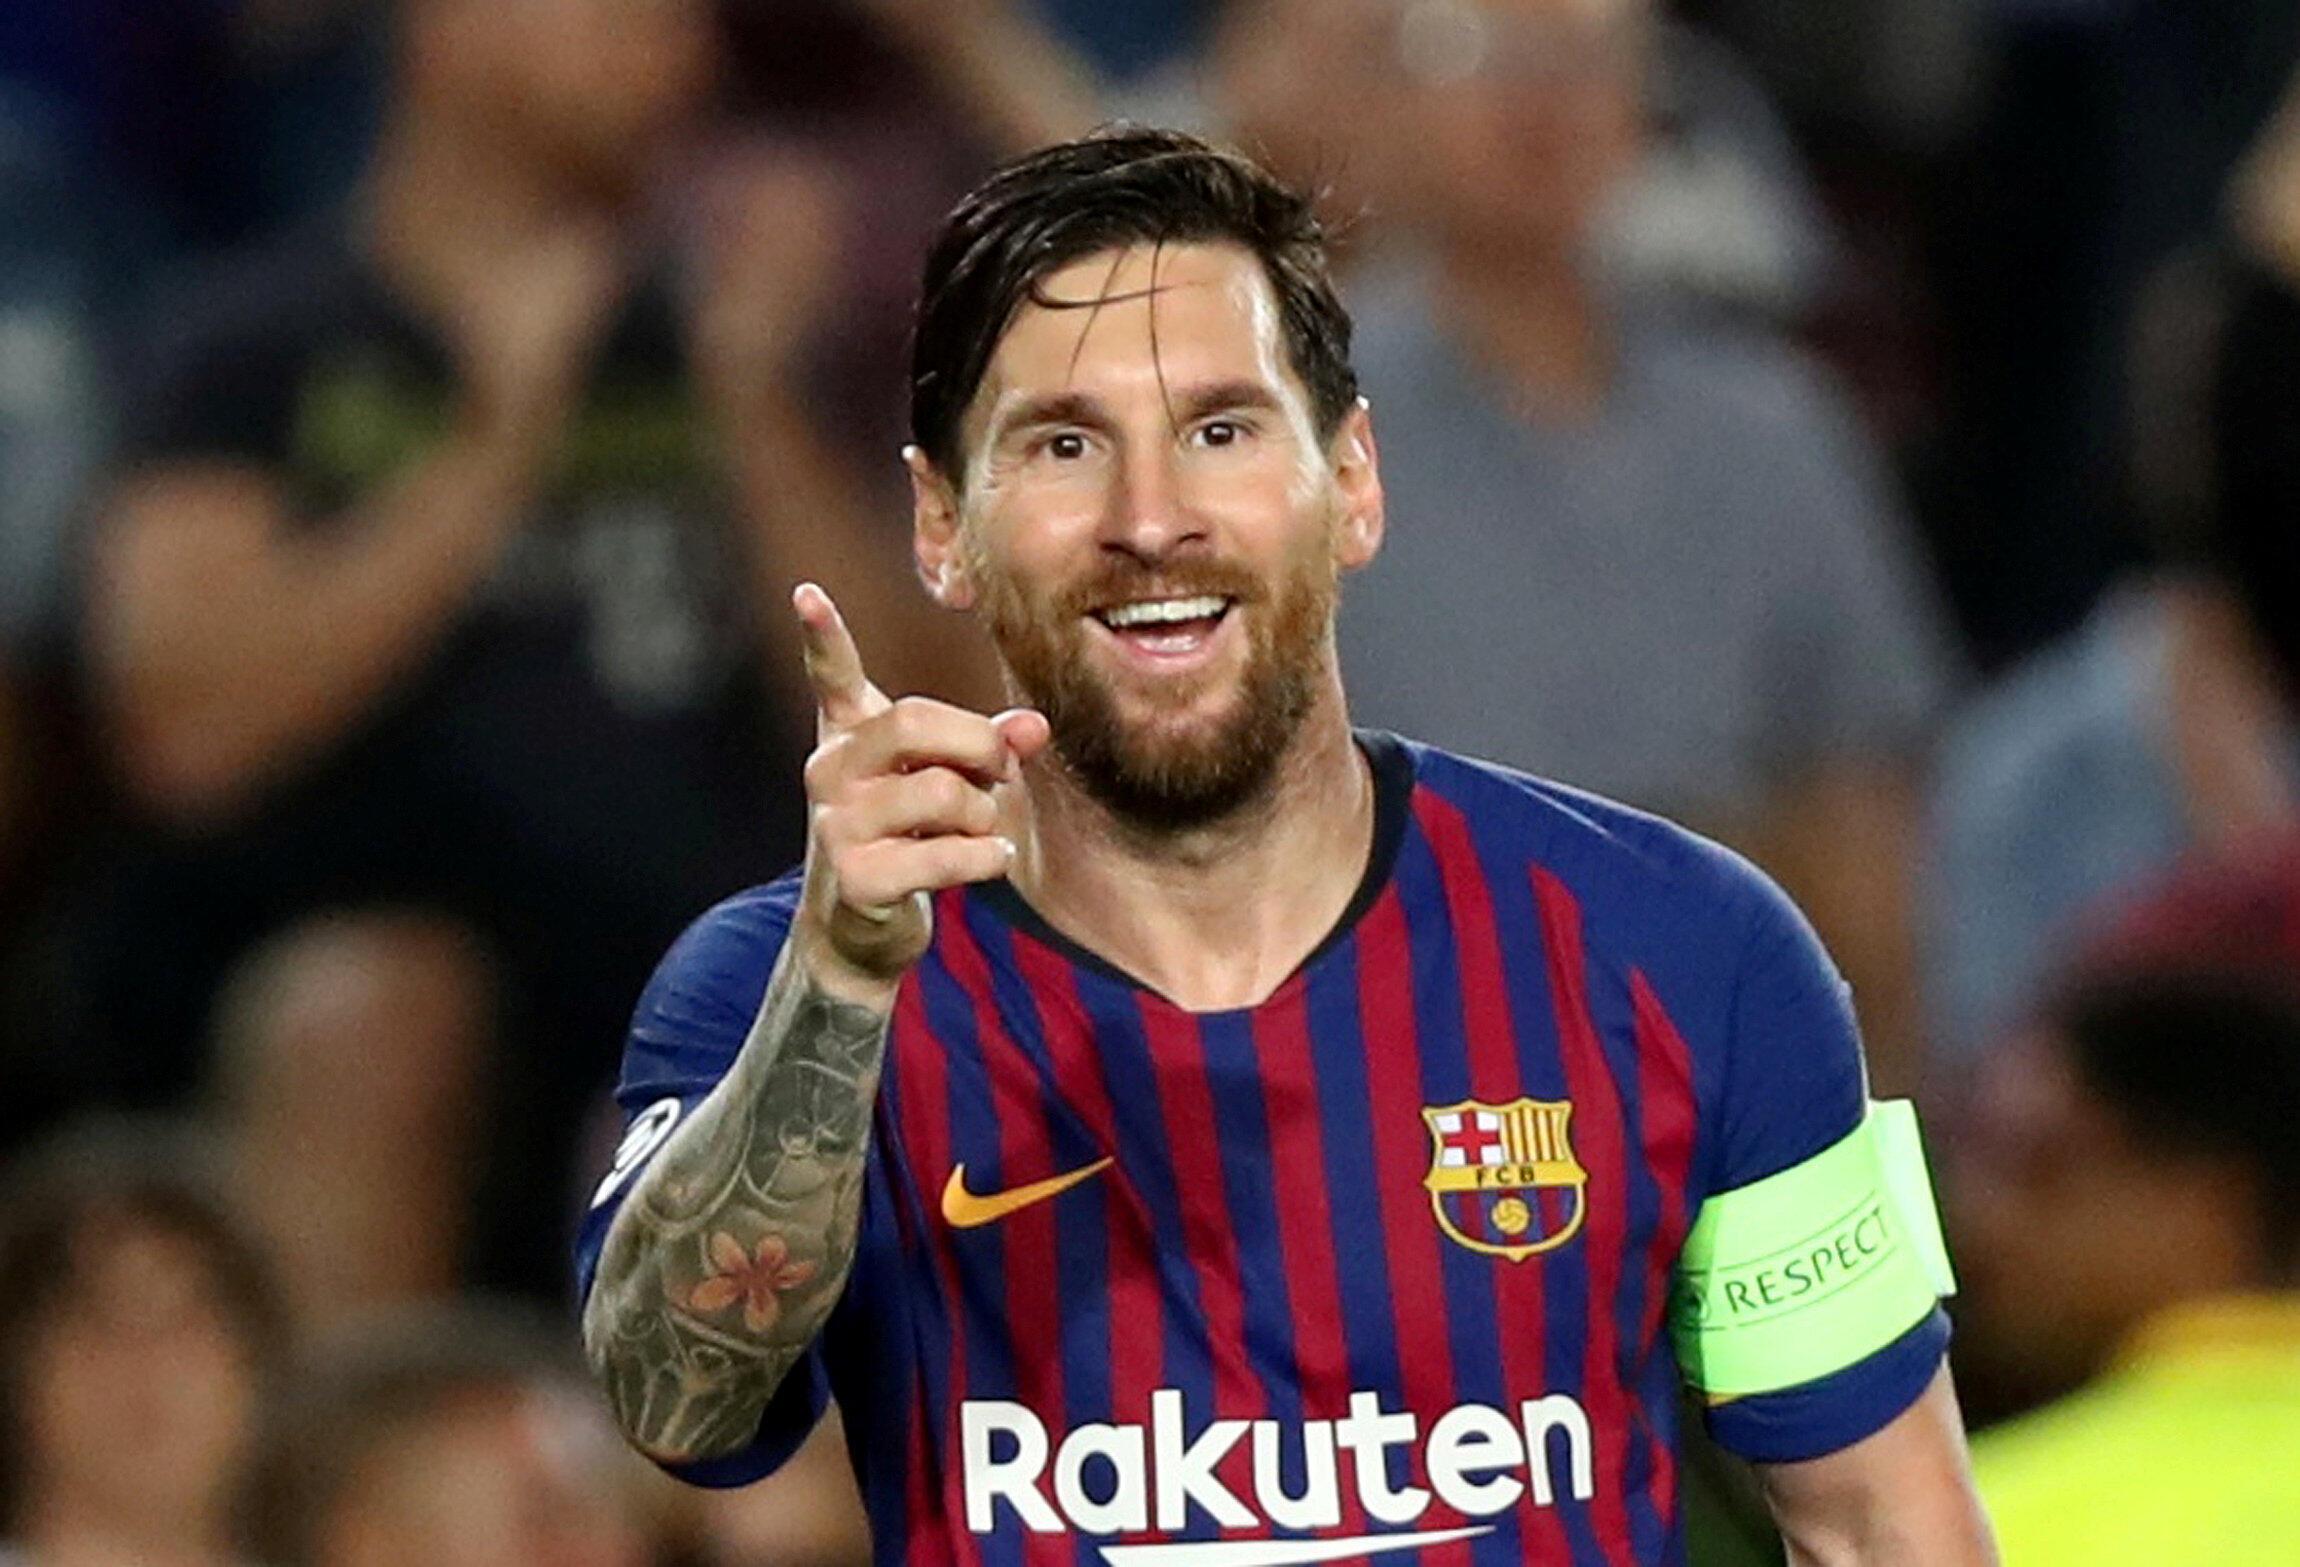 Dan wasan Barcelona Lionel Messi.